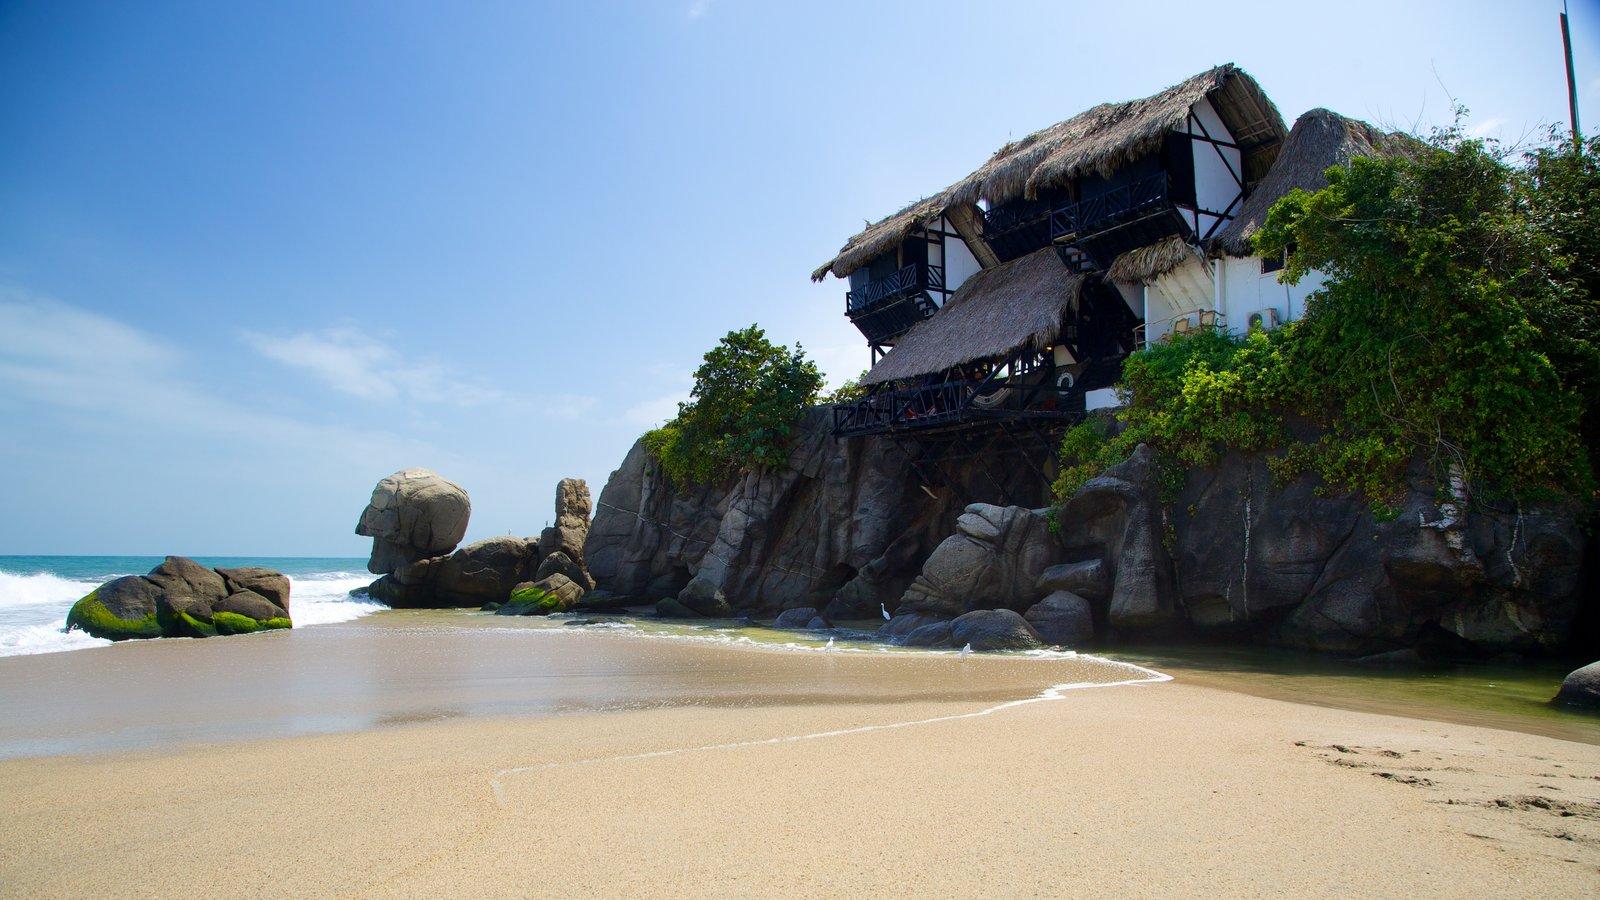 Santa Marta featuring rocky coastline, a house and a sandy beach